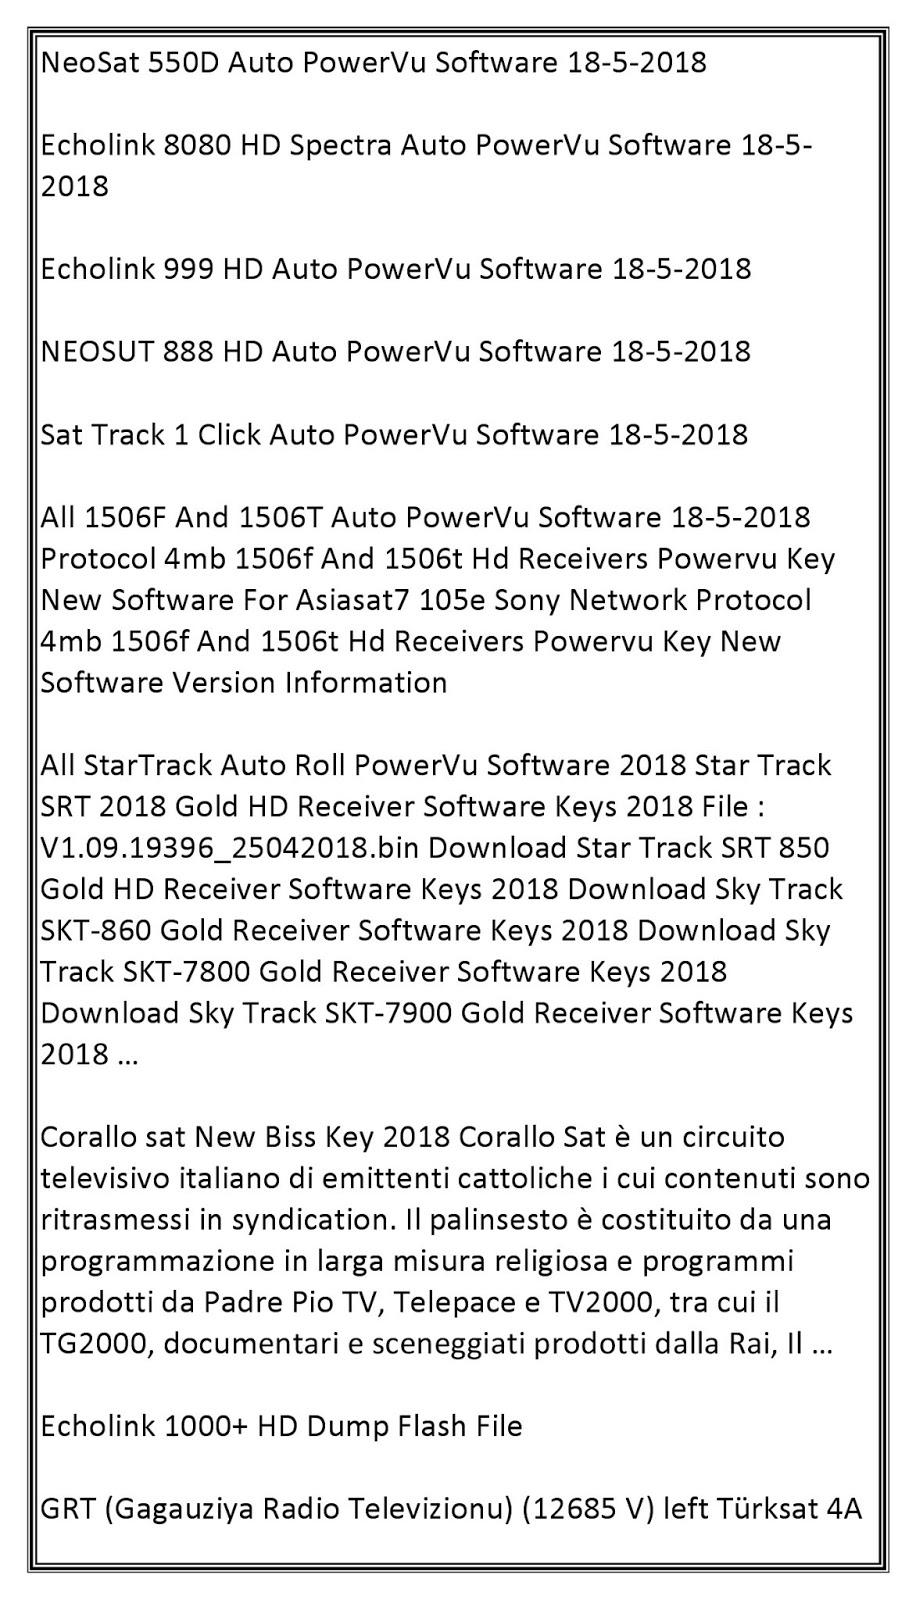 Satellite TV News: Satellite Television News 22-5-18